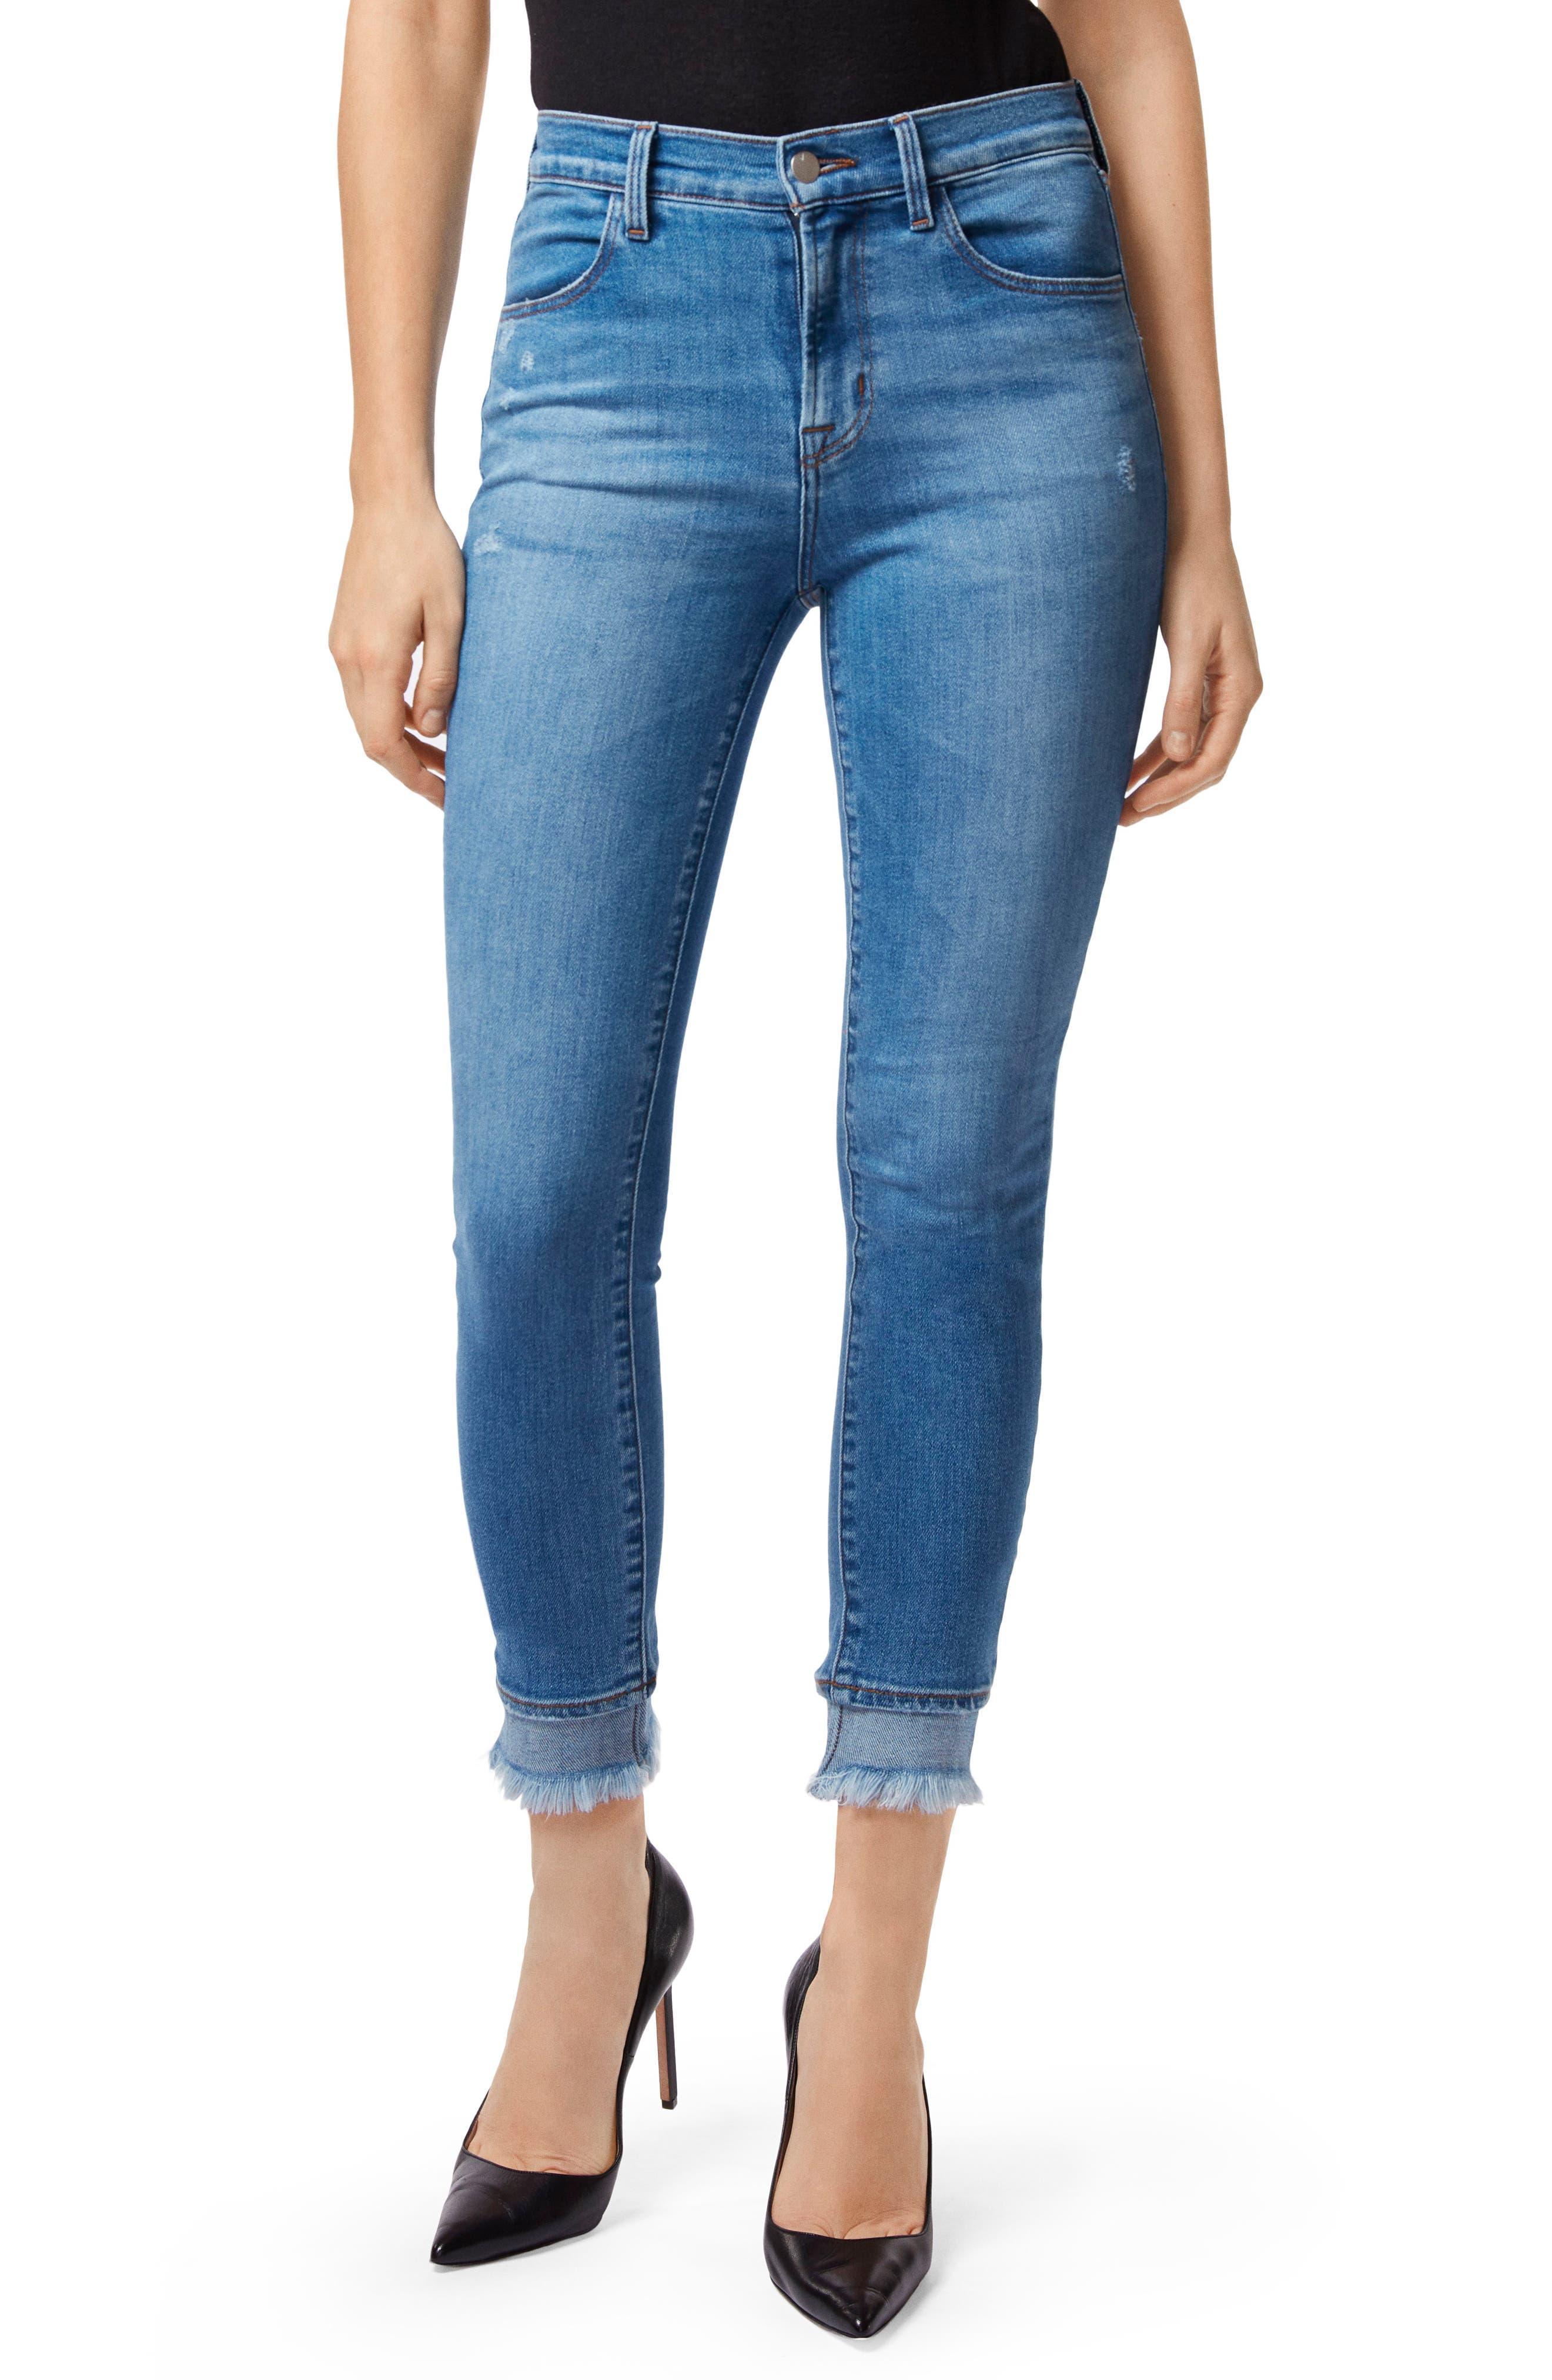 Alana Frayed High Waist Ankle Skinny Jeans,                             Main thumbnail 1, color,                             453